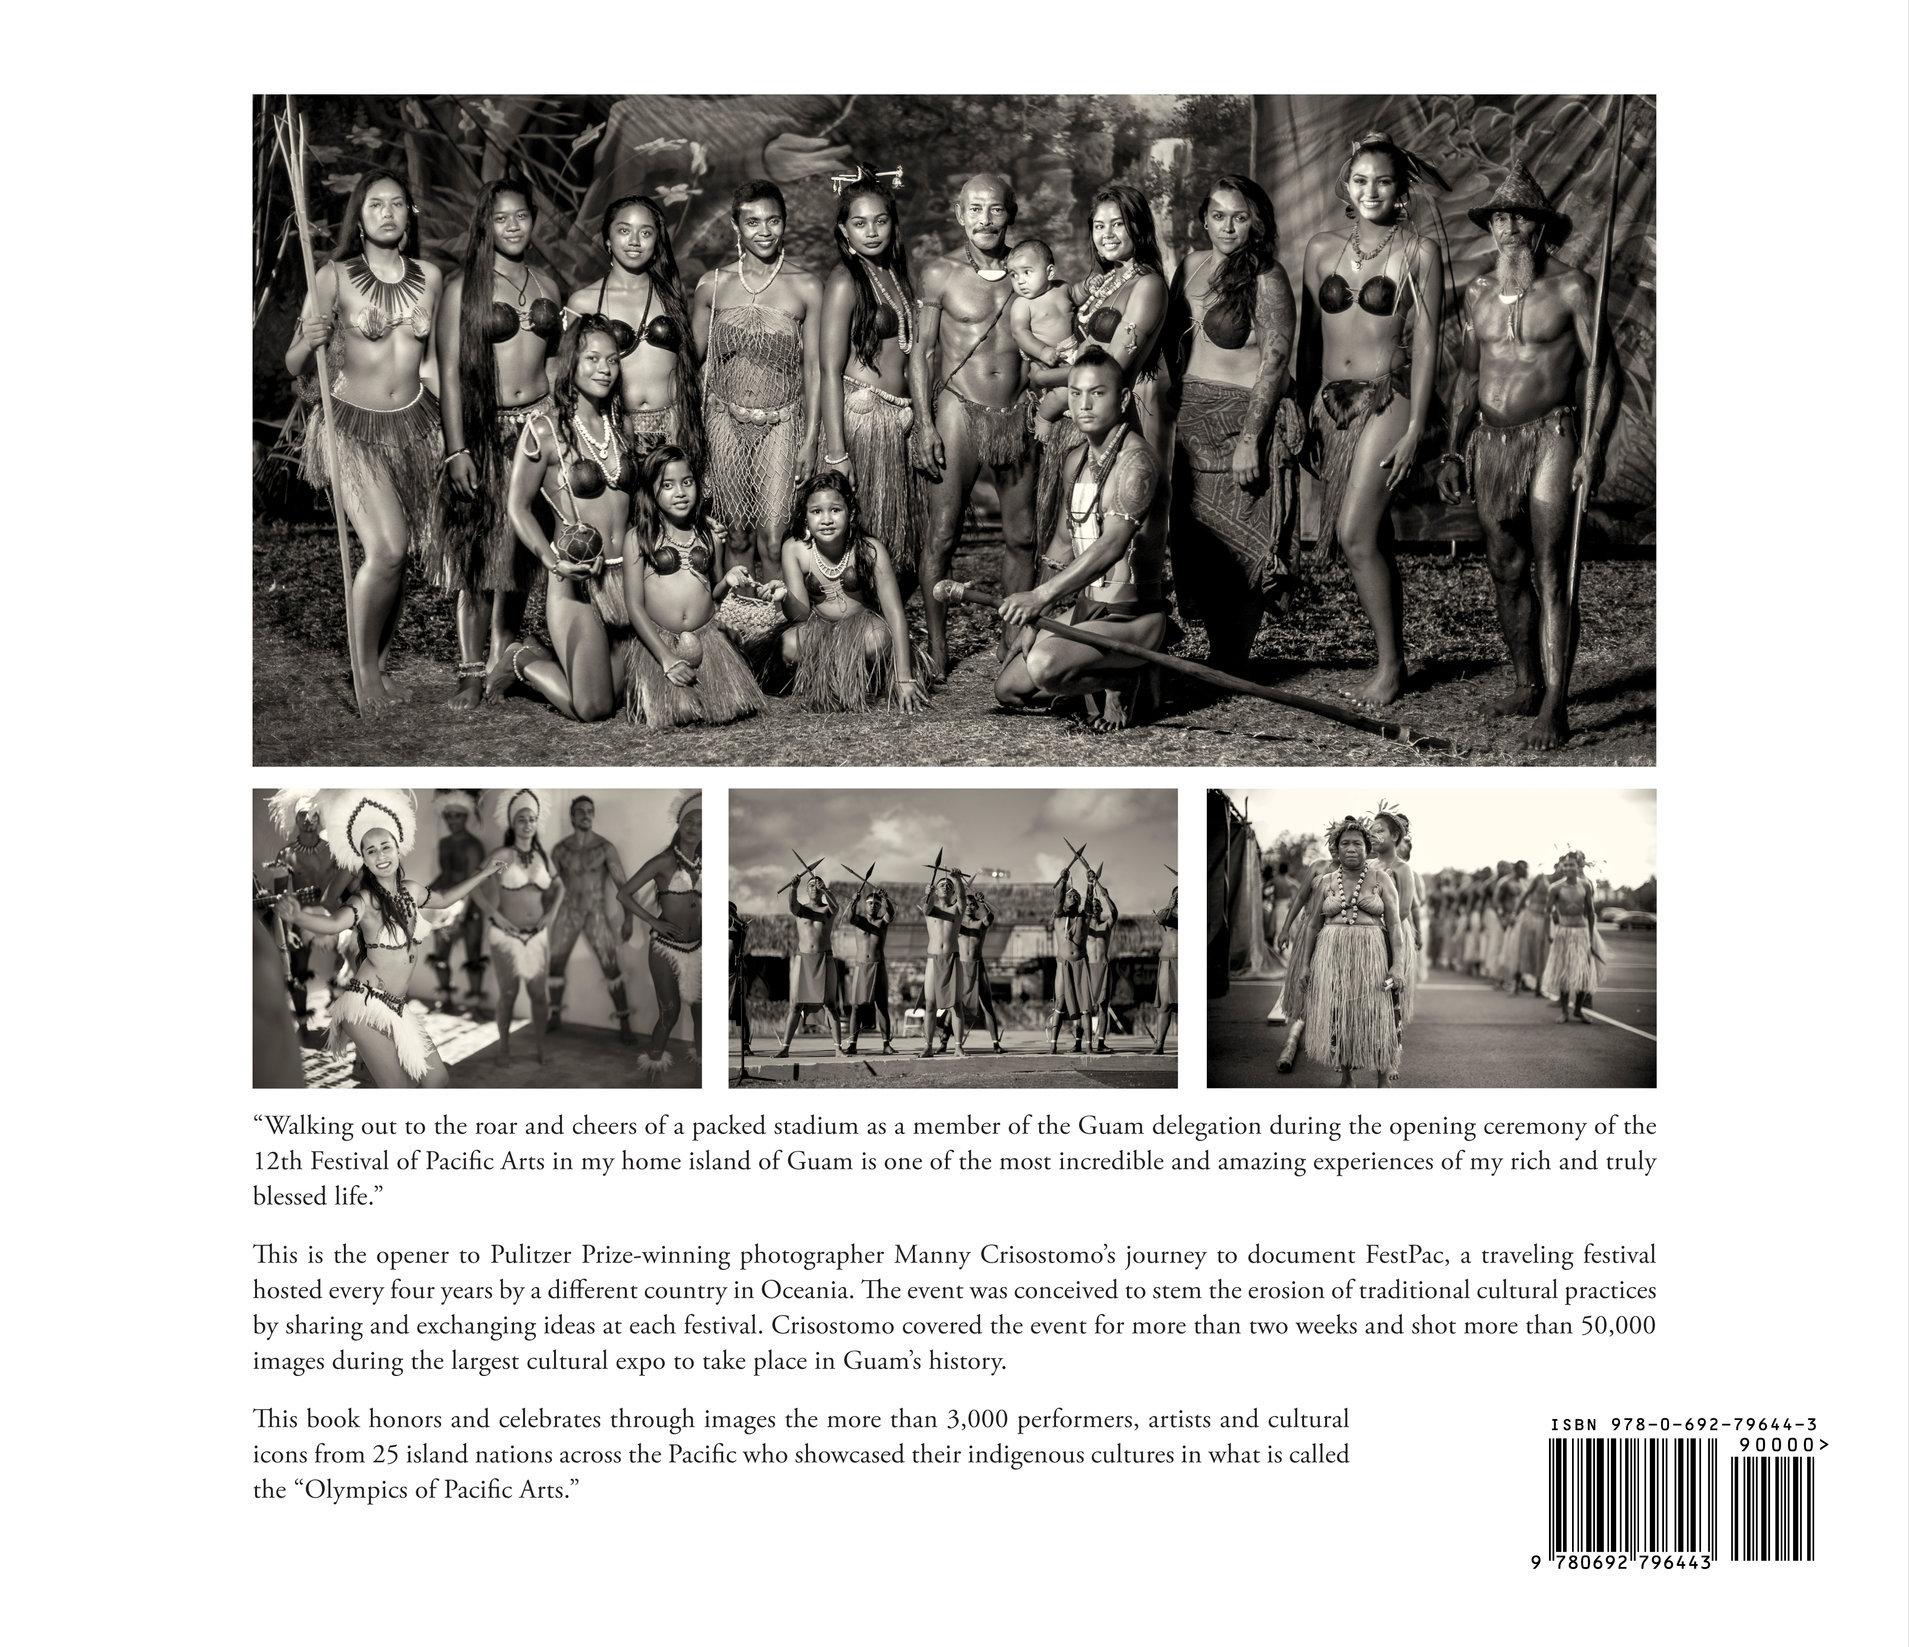 GVB-FestPac Book3-LG-108.jpg